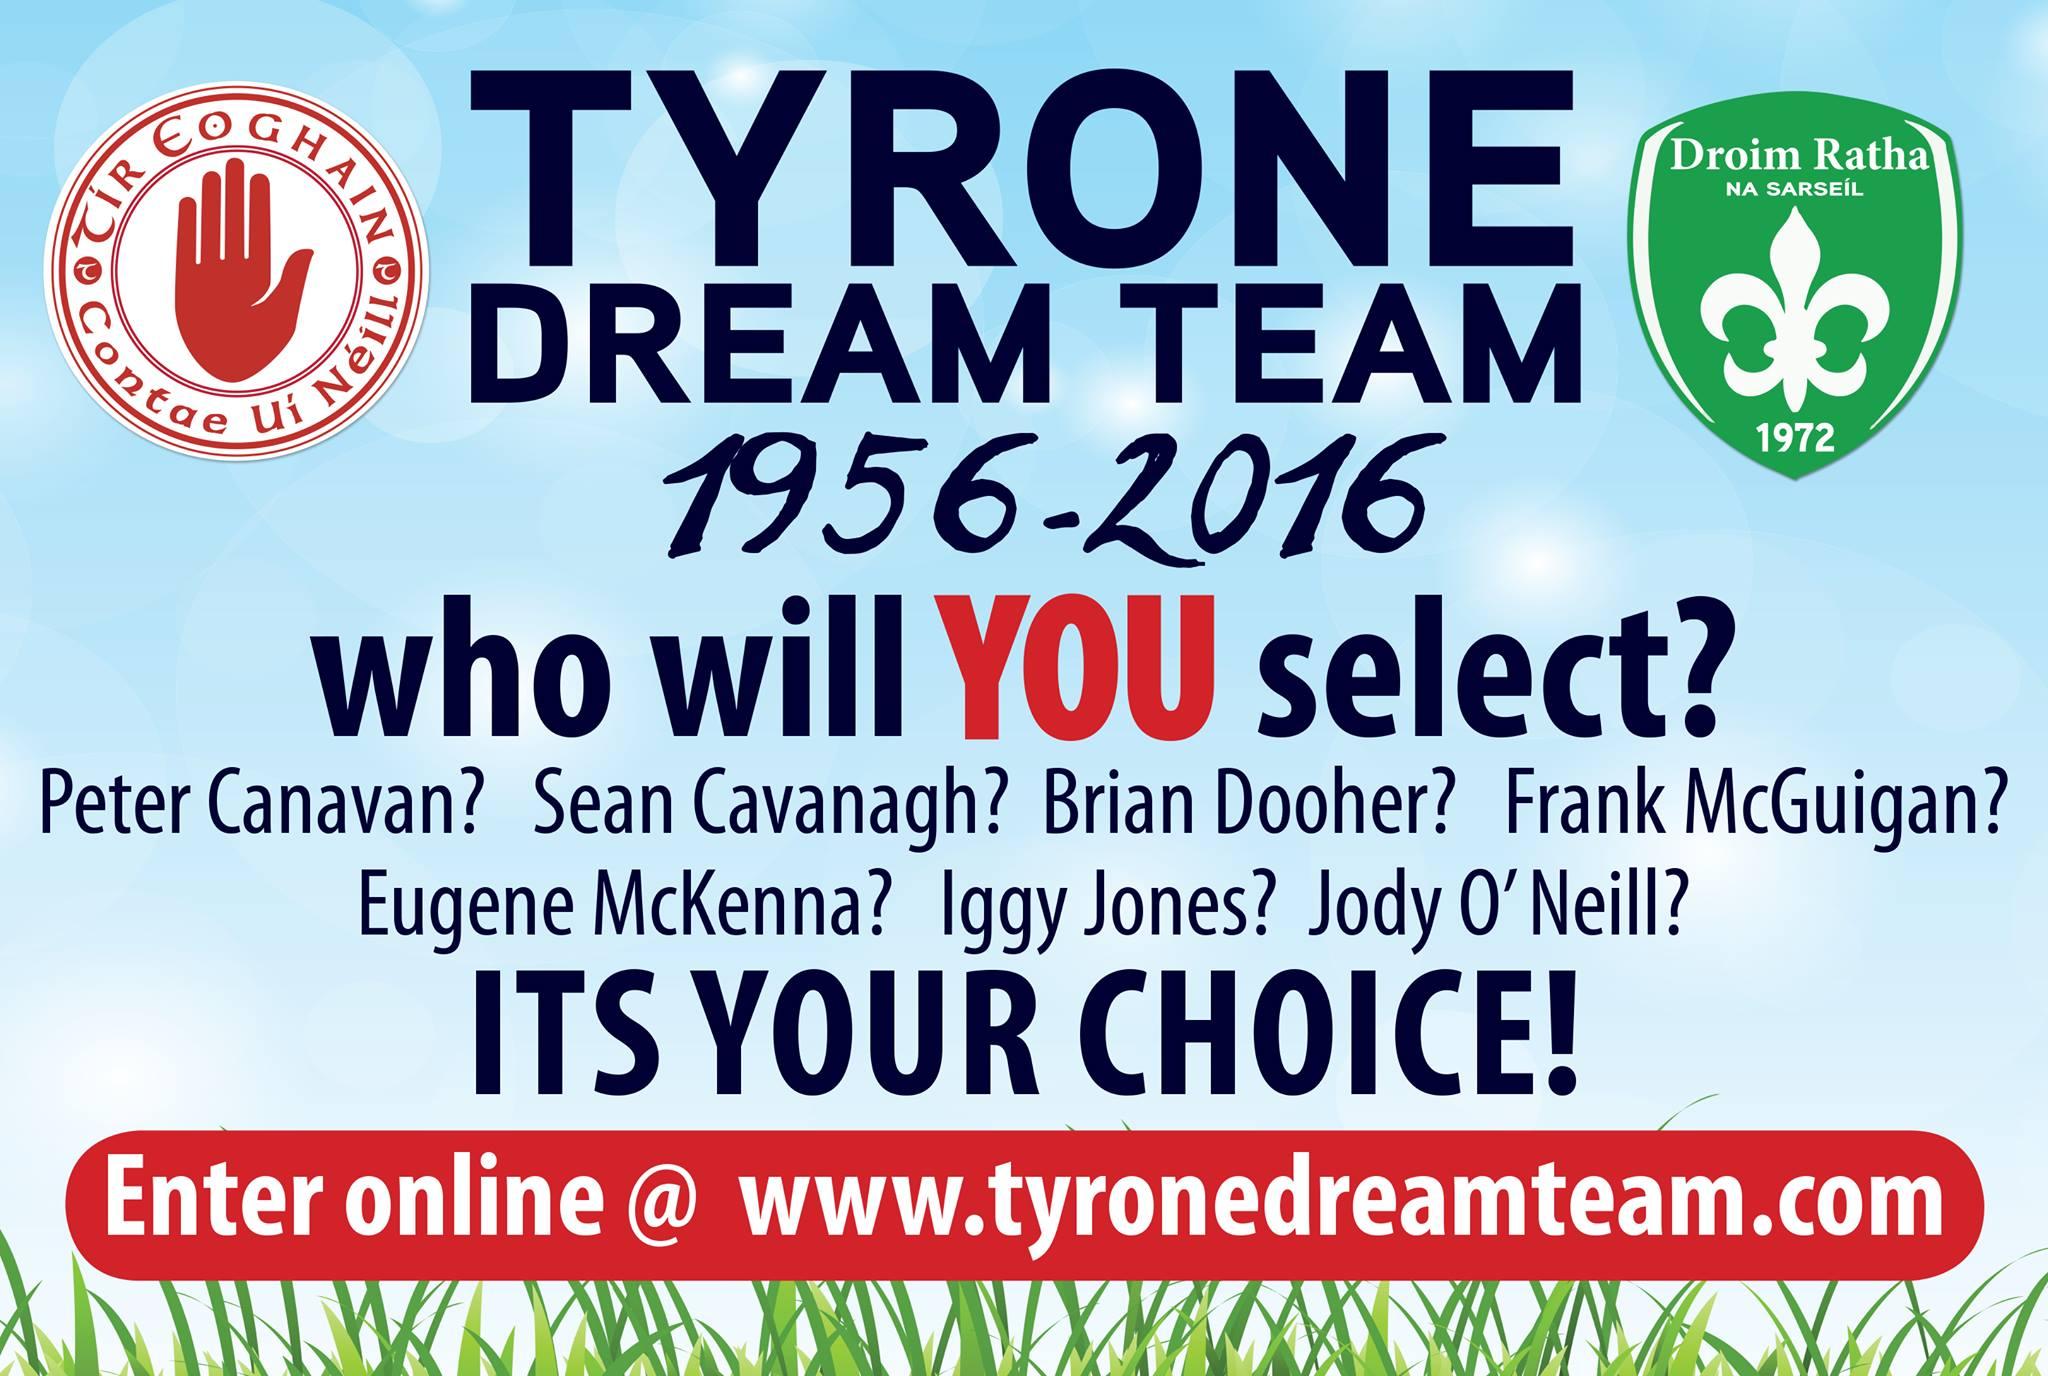 Tyrone Dream Team announced tonight